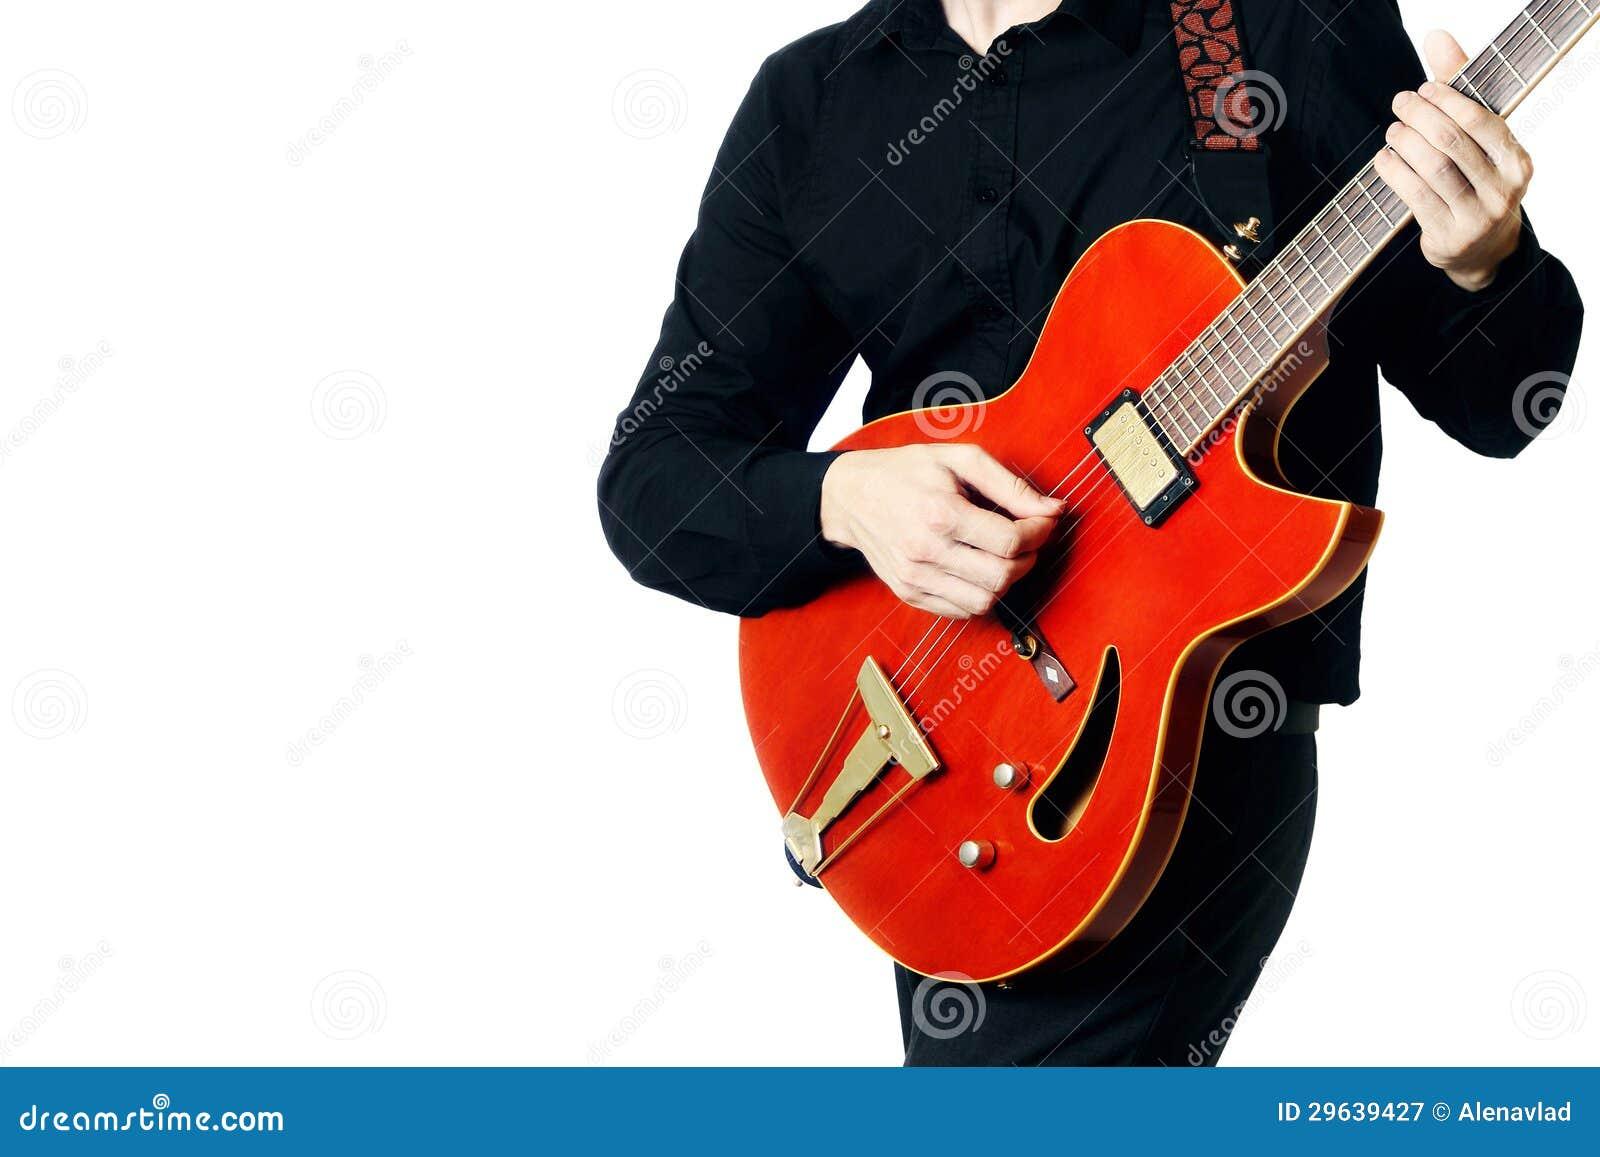 Guitar playing dude fucks a hot country girl 4